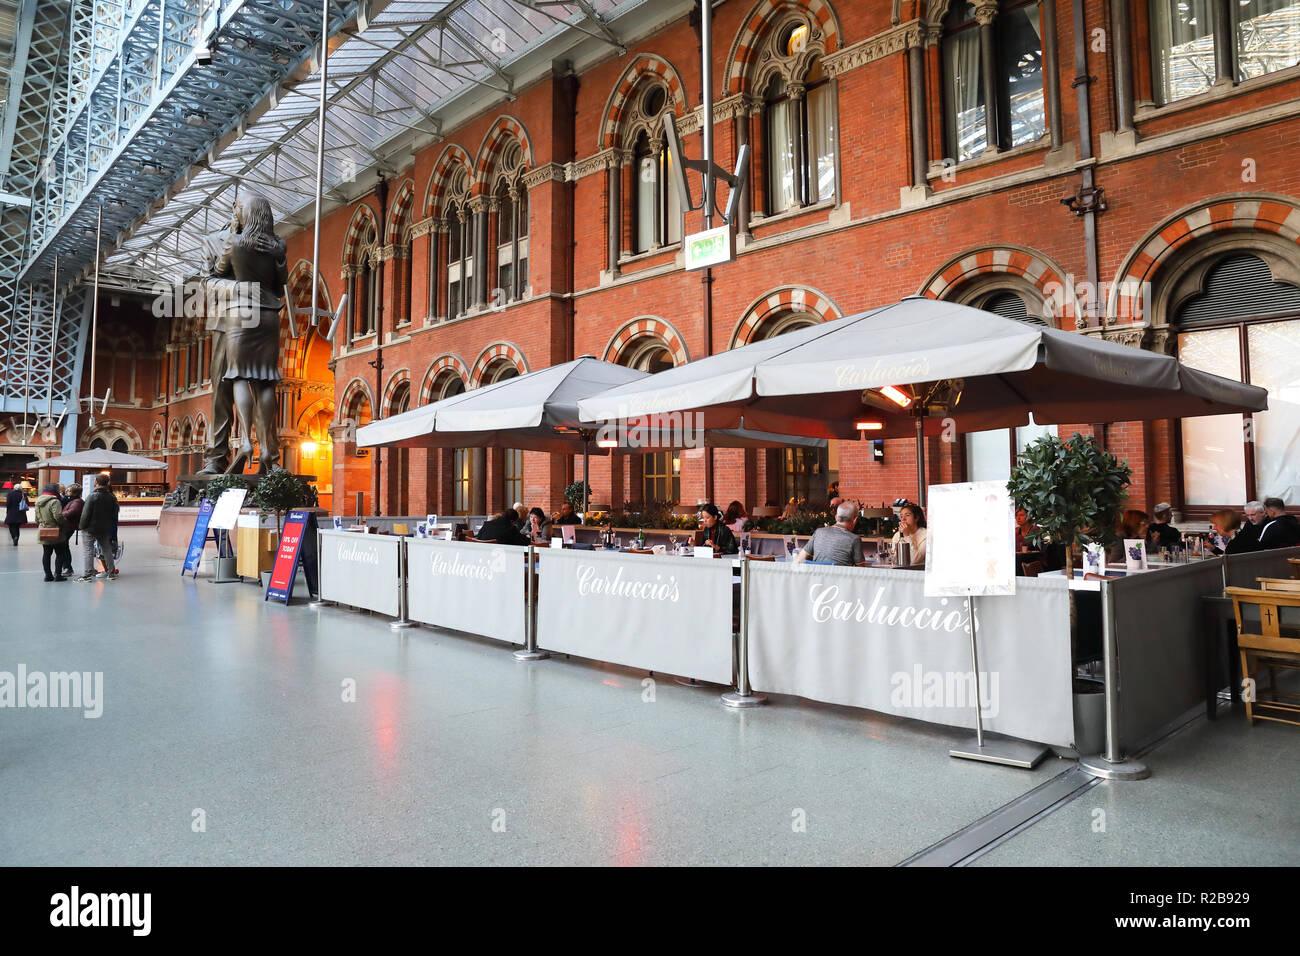 Carluccio's restaurant at St Pancras International train station, in London, UK - Stock Image